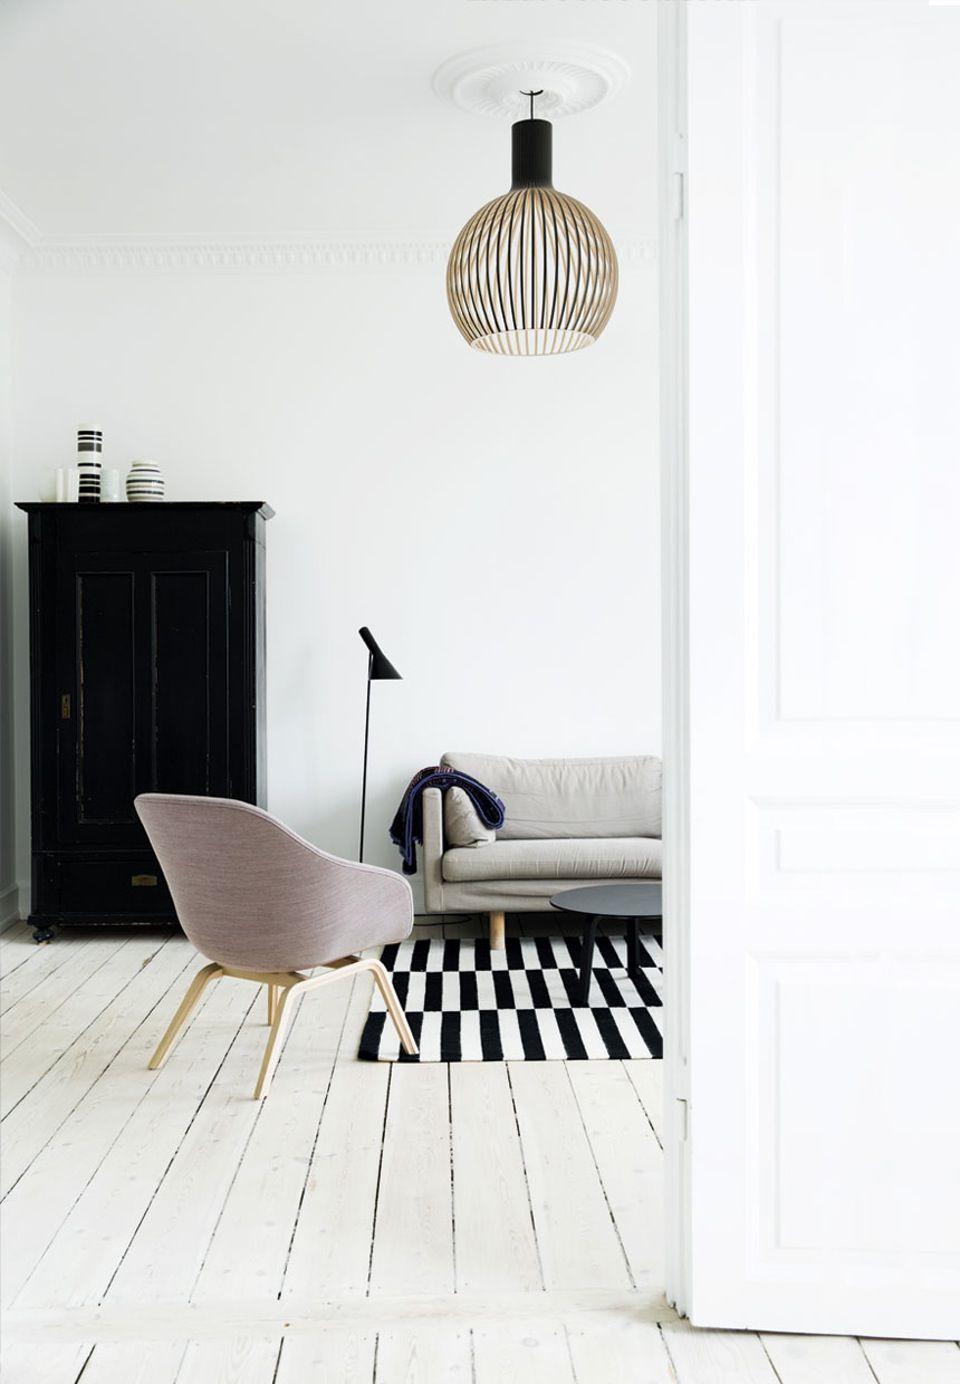 Via Bolig Magasinet   Nordic Interior   Arne Jacobsen   HAY ähnliche ...